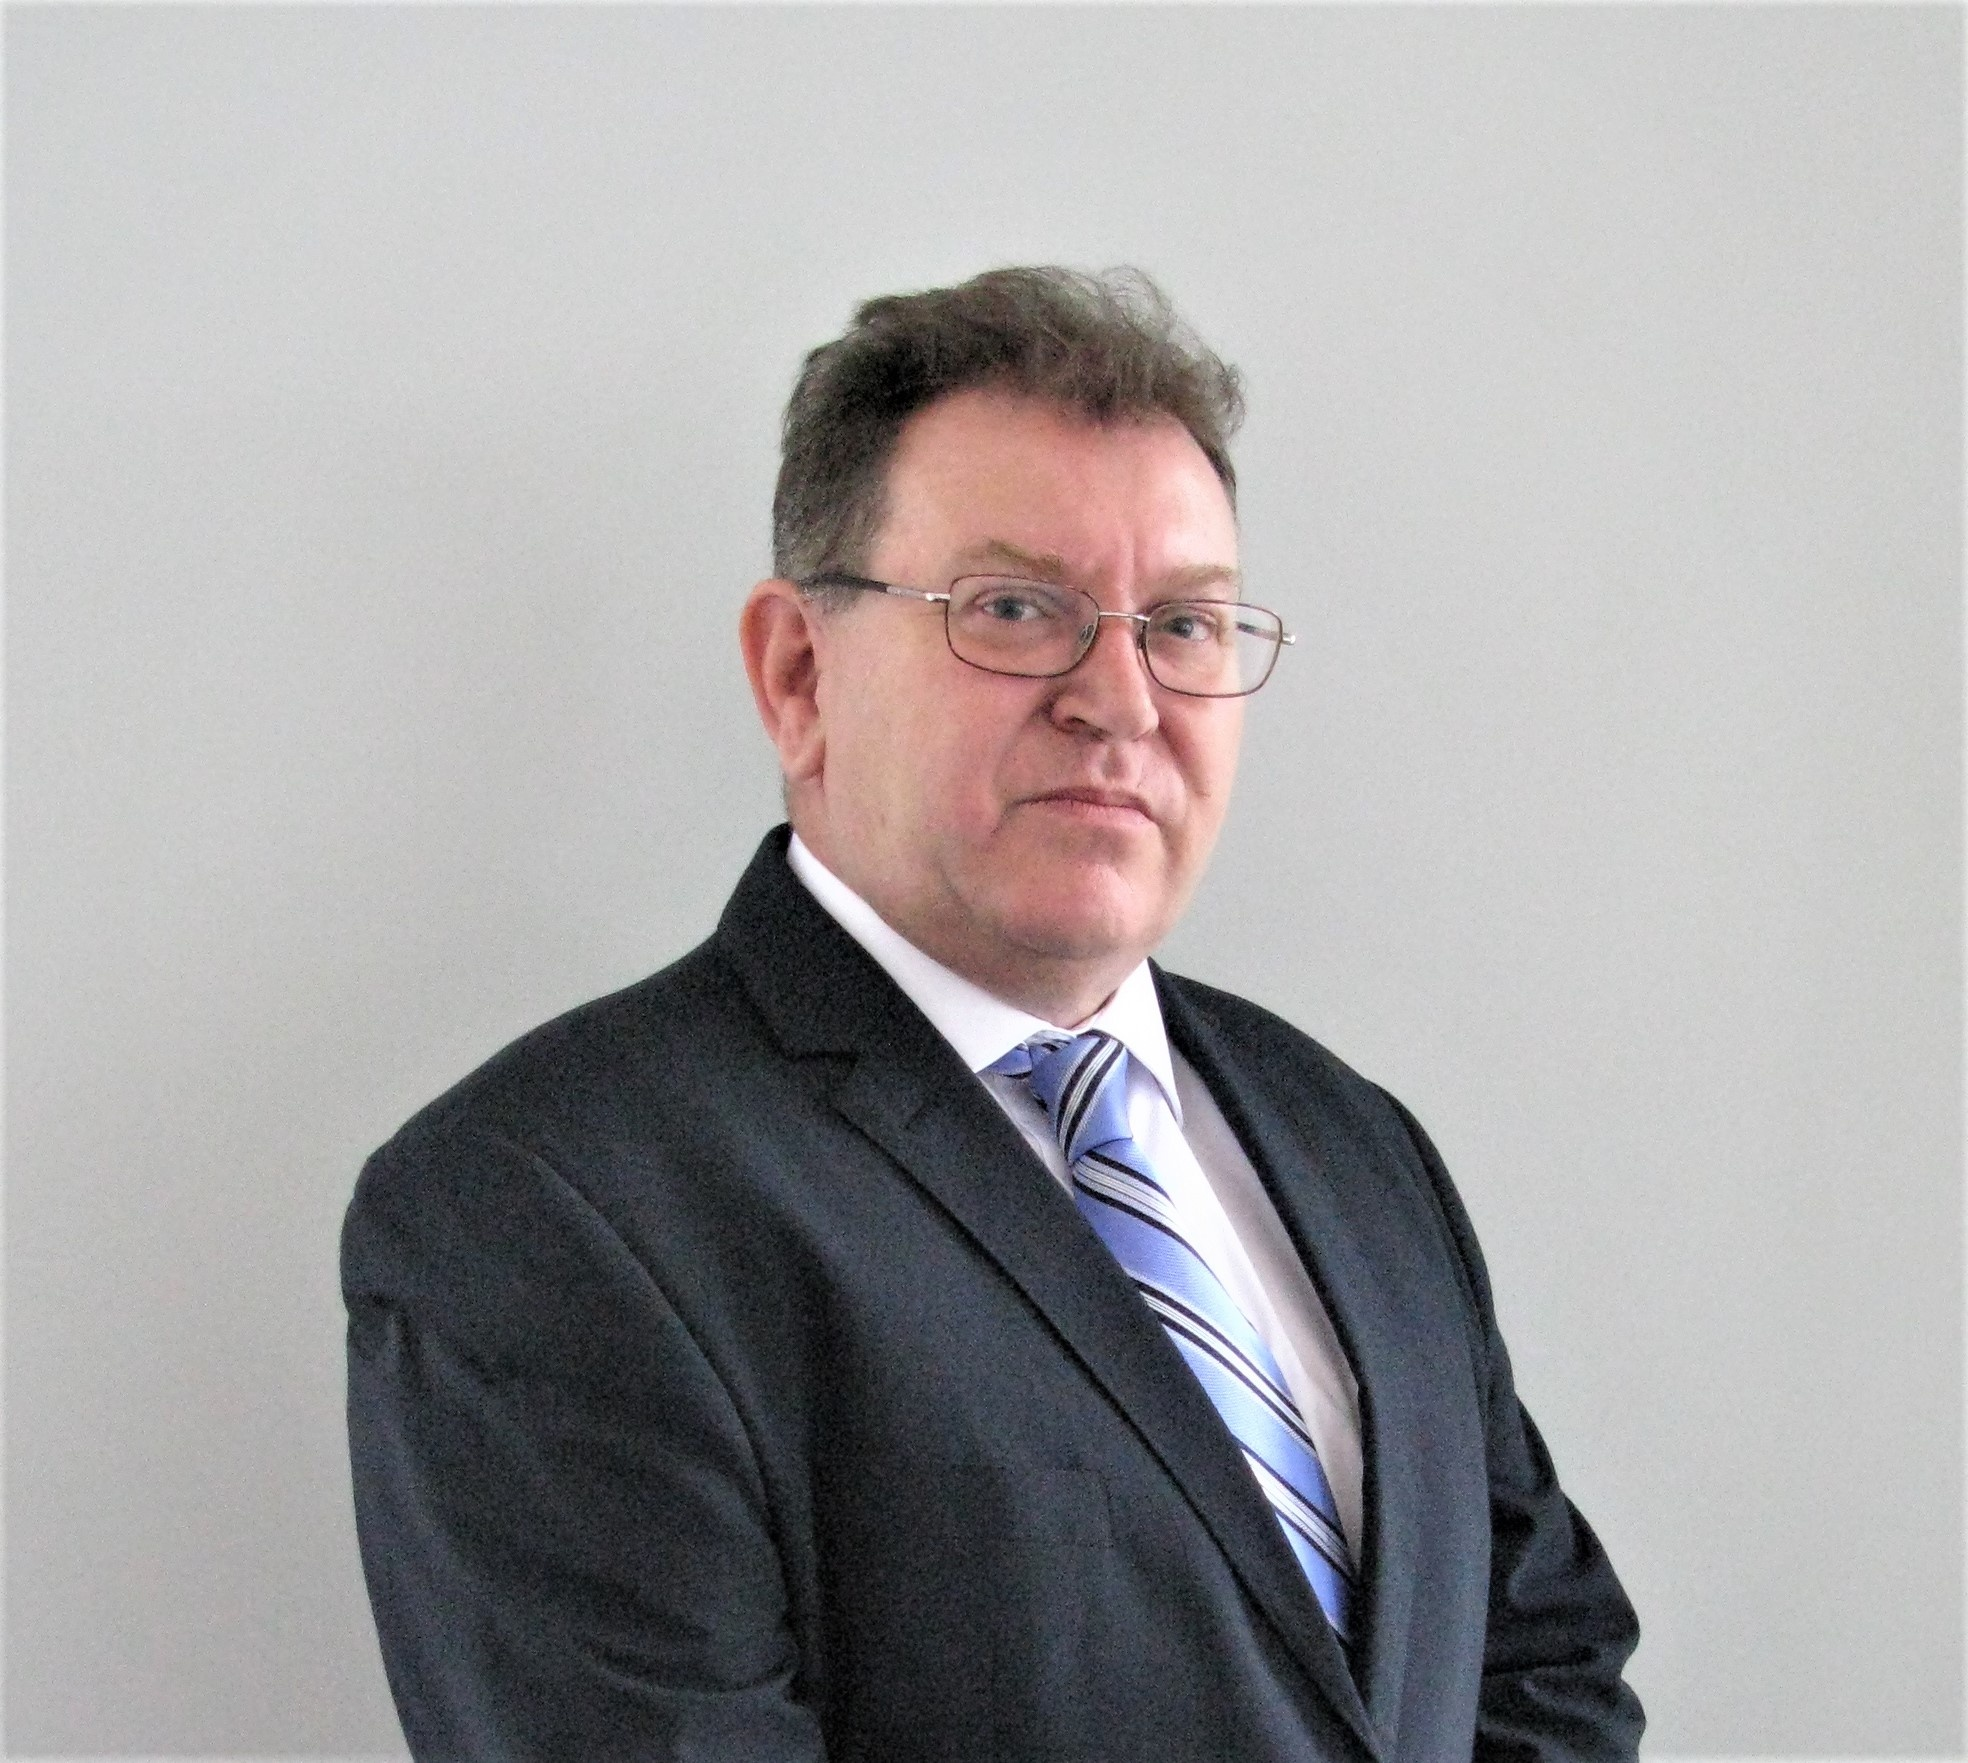 Wayne Walker - PICA Group CEO